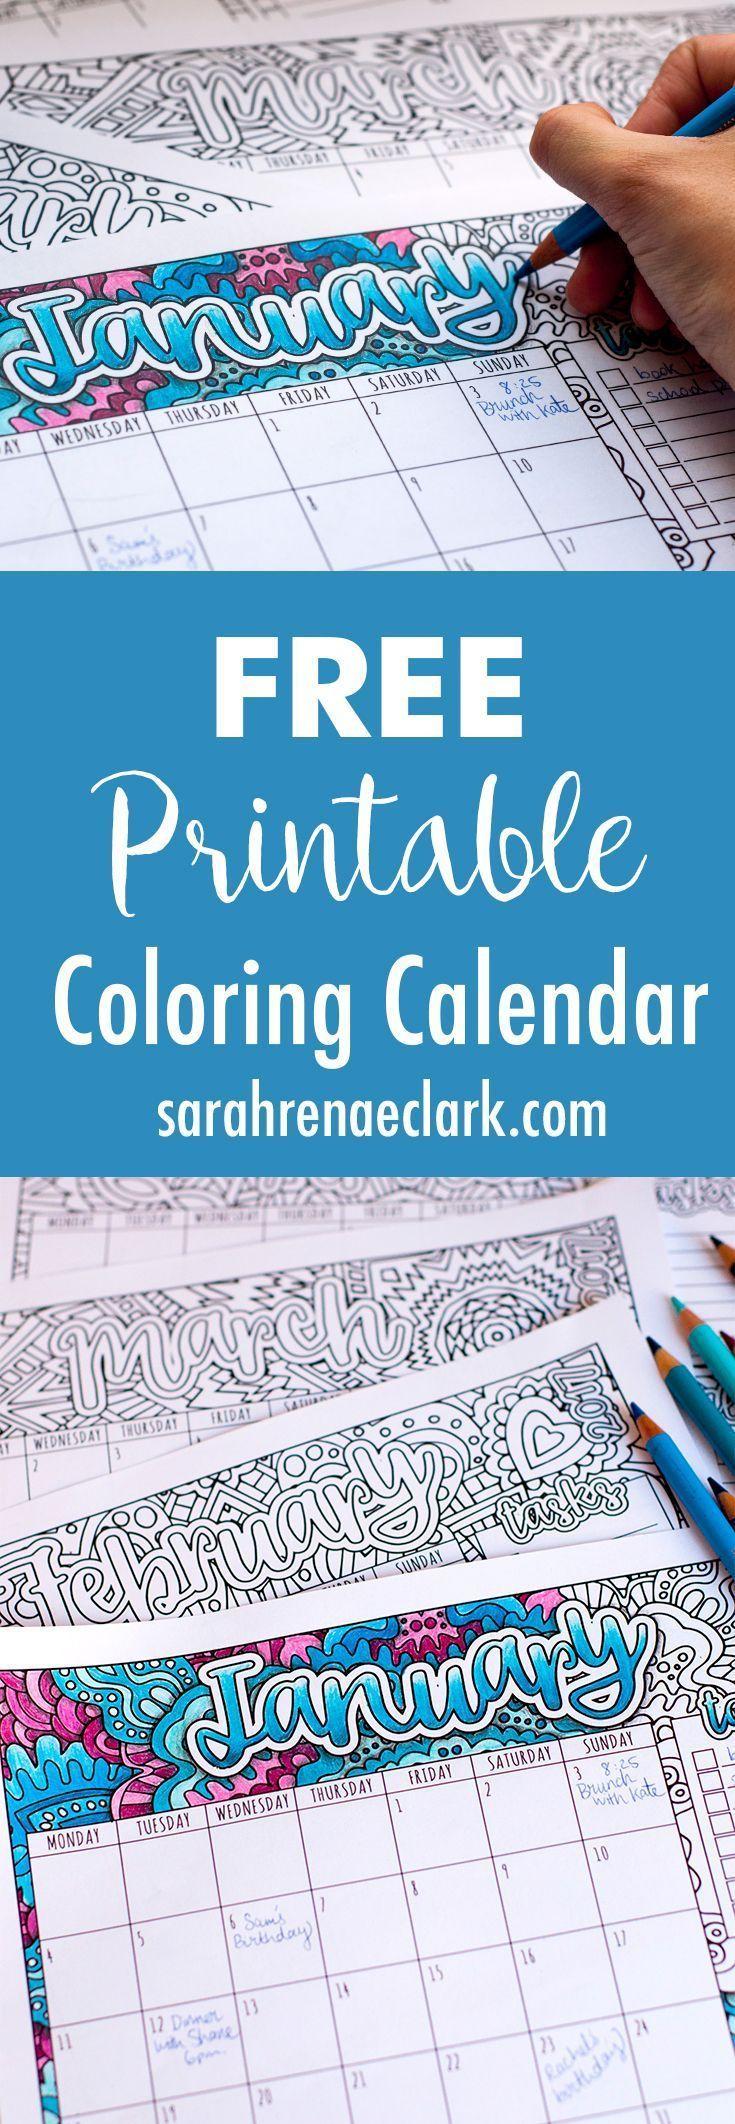 Free Printable Coloring Calendar with BONUS tutorial on how to create shadows wi...